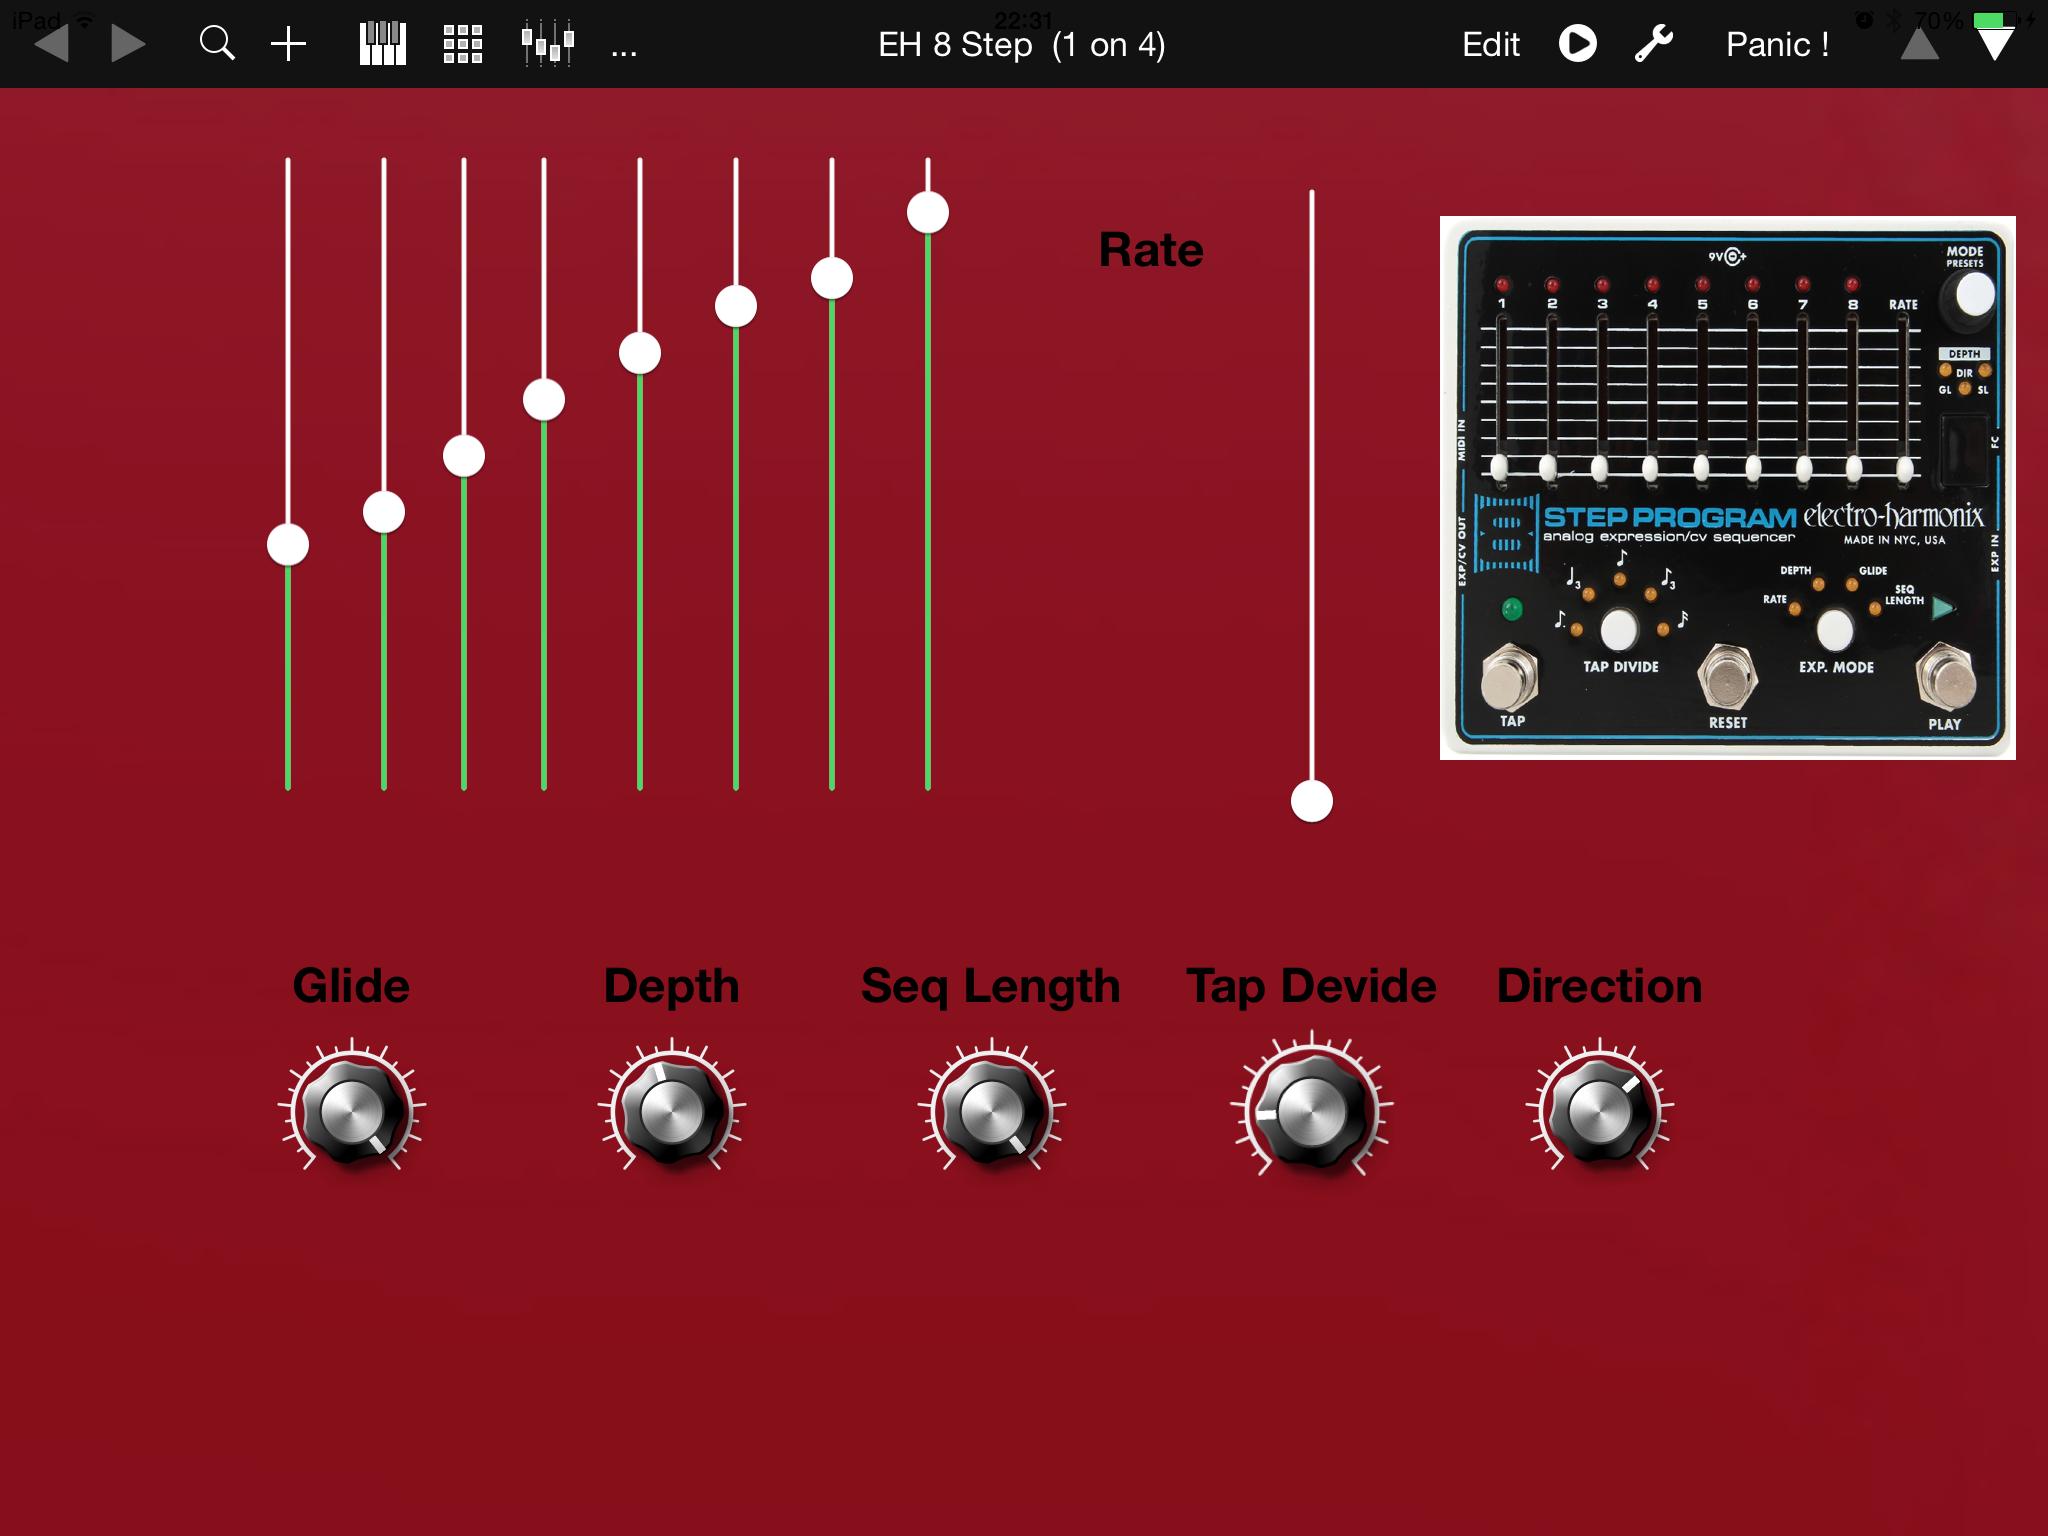 electro harmonix 8 step midi controller for ipad